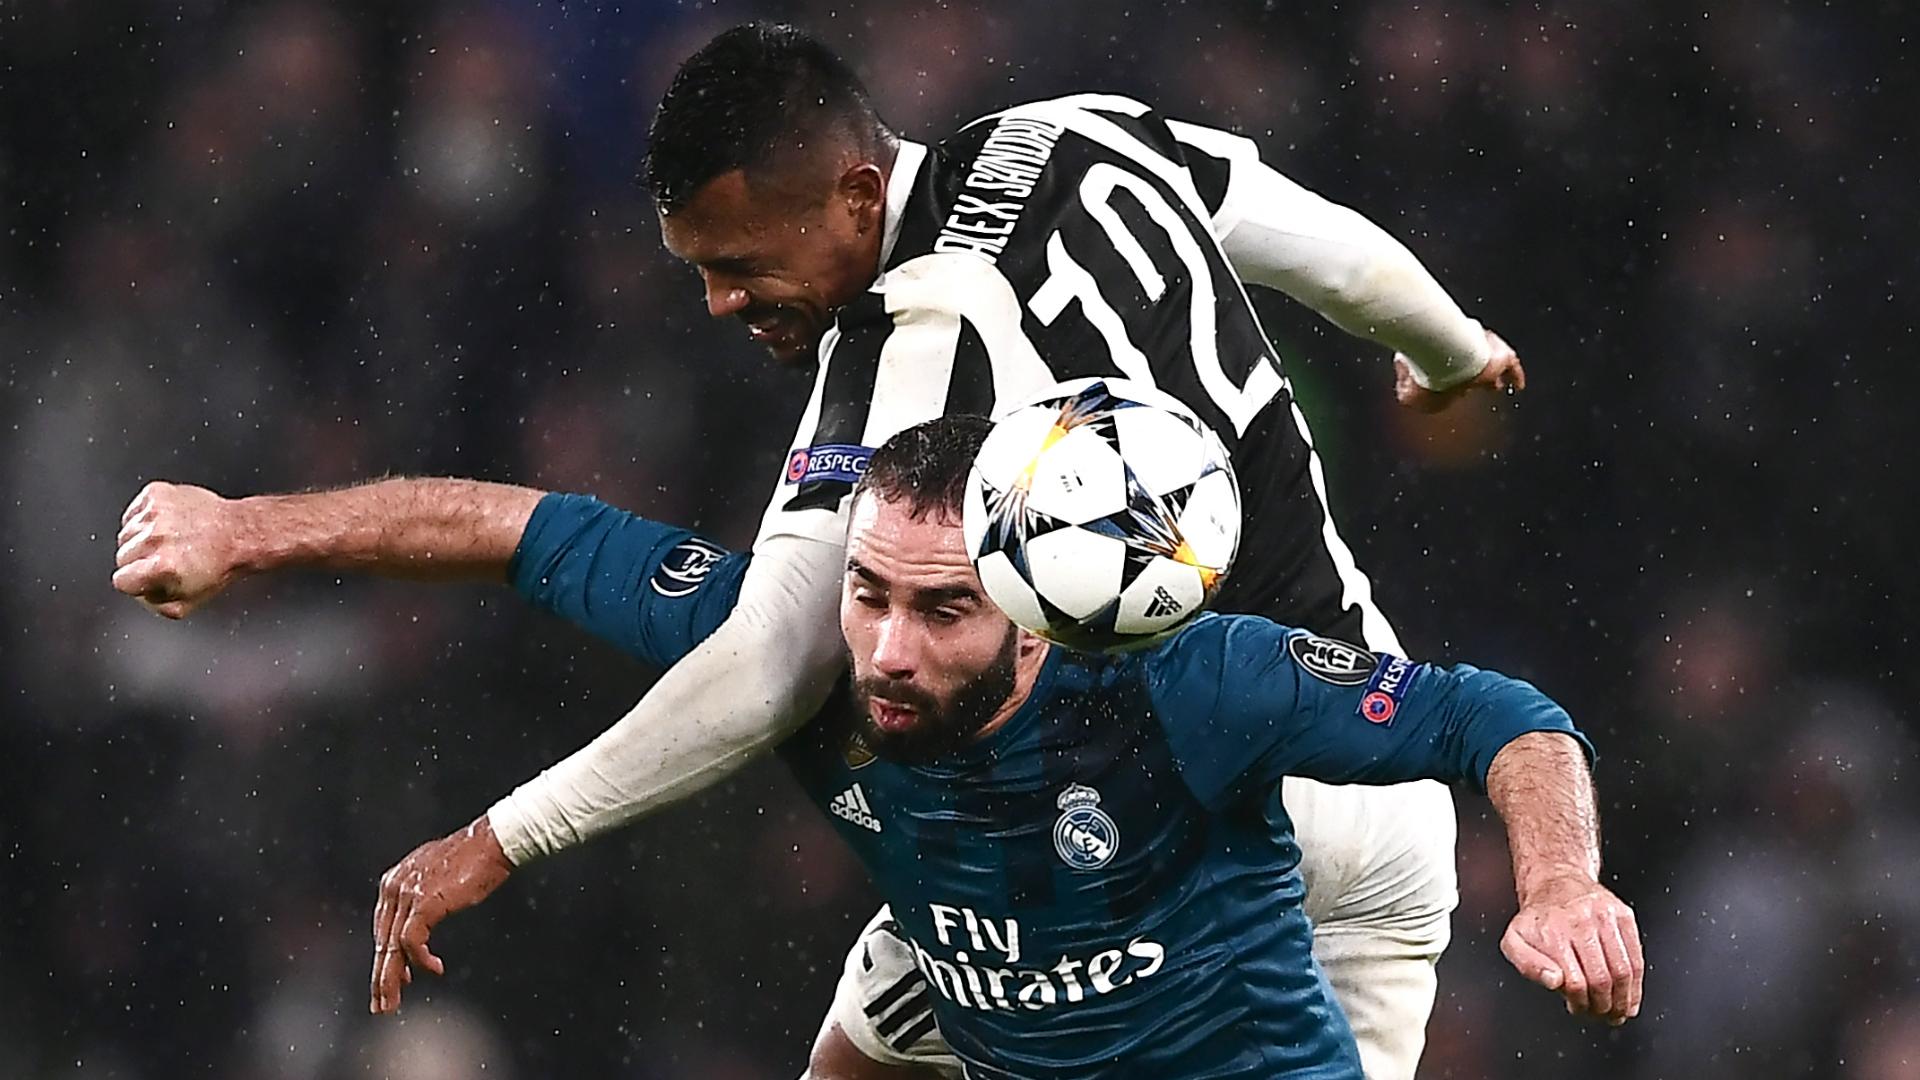 Carvajal Alex Sandro Juventus Real Madrid Champions League